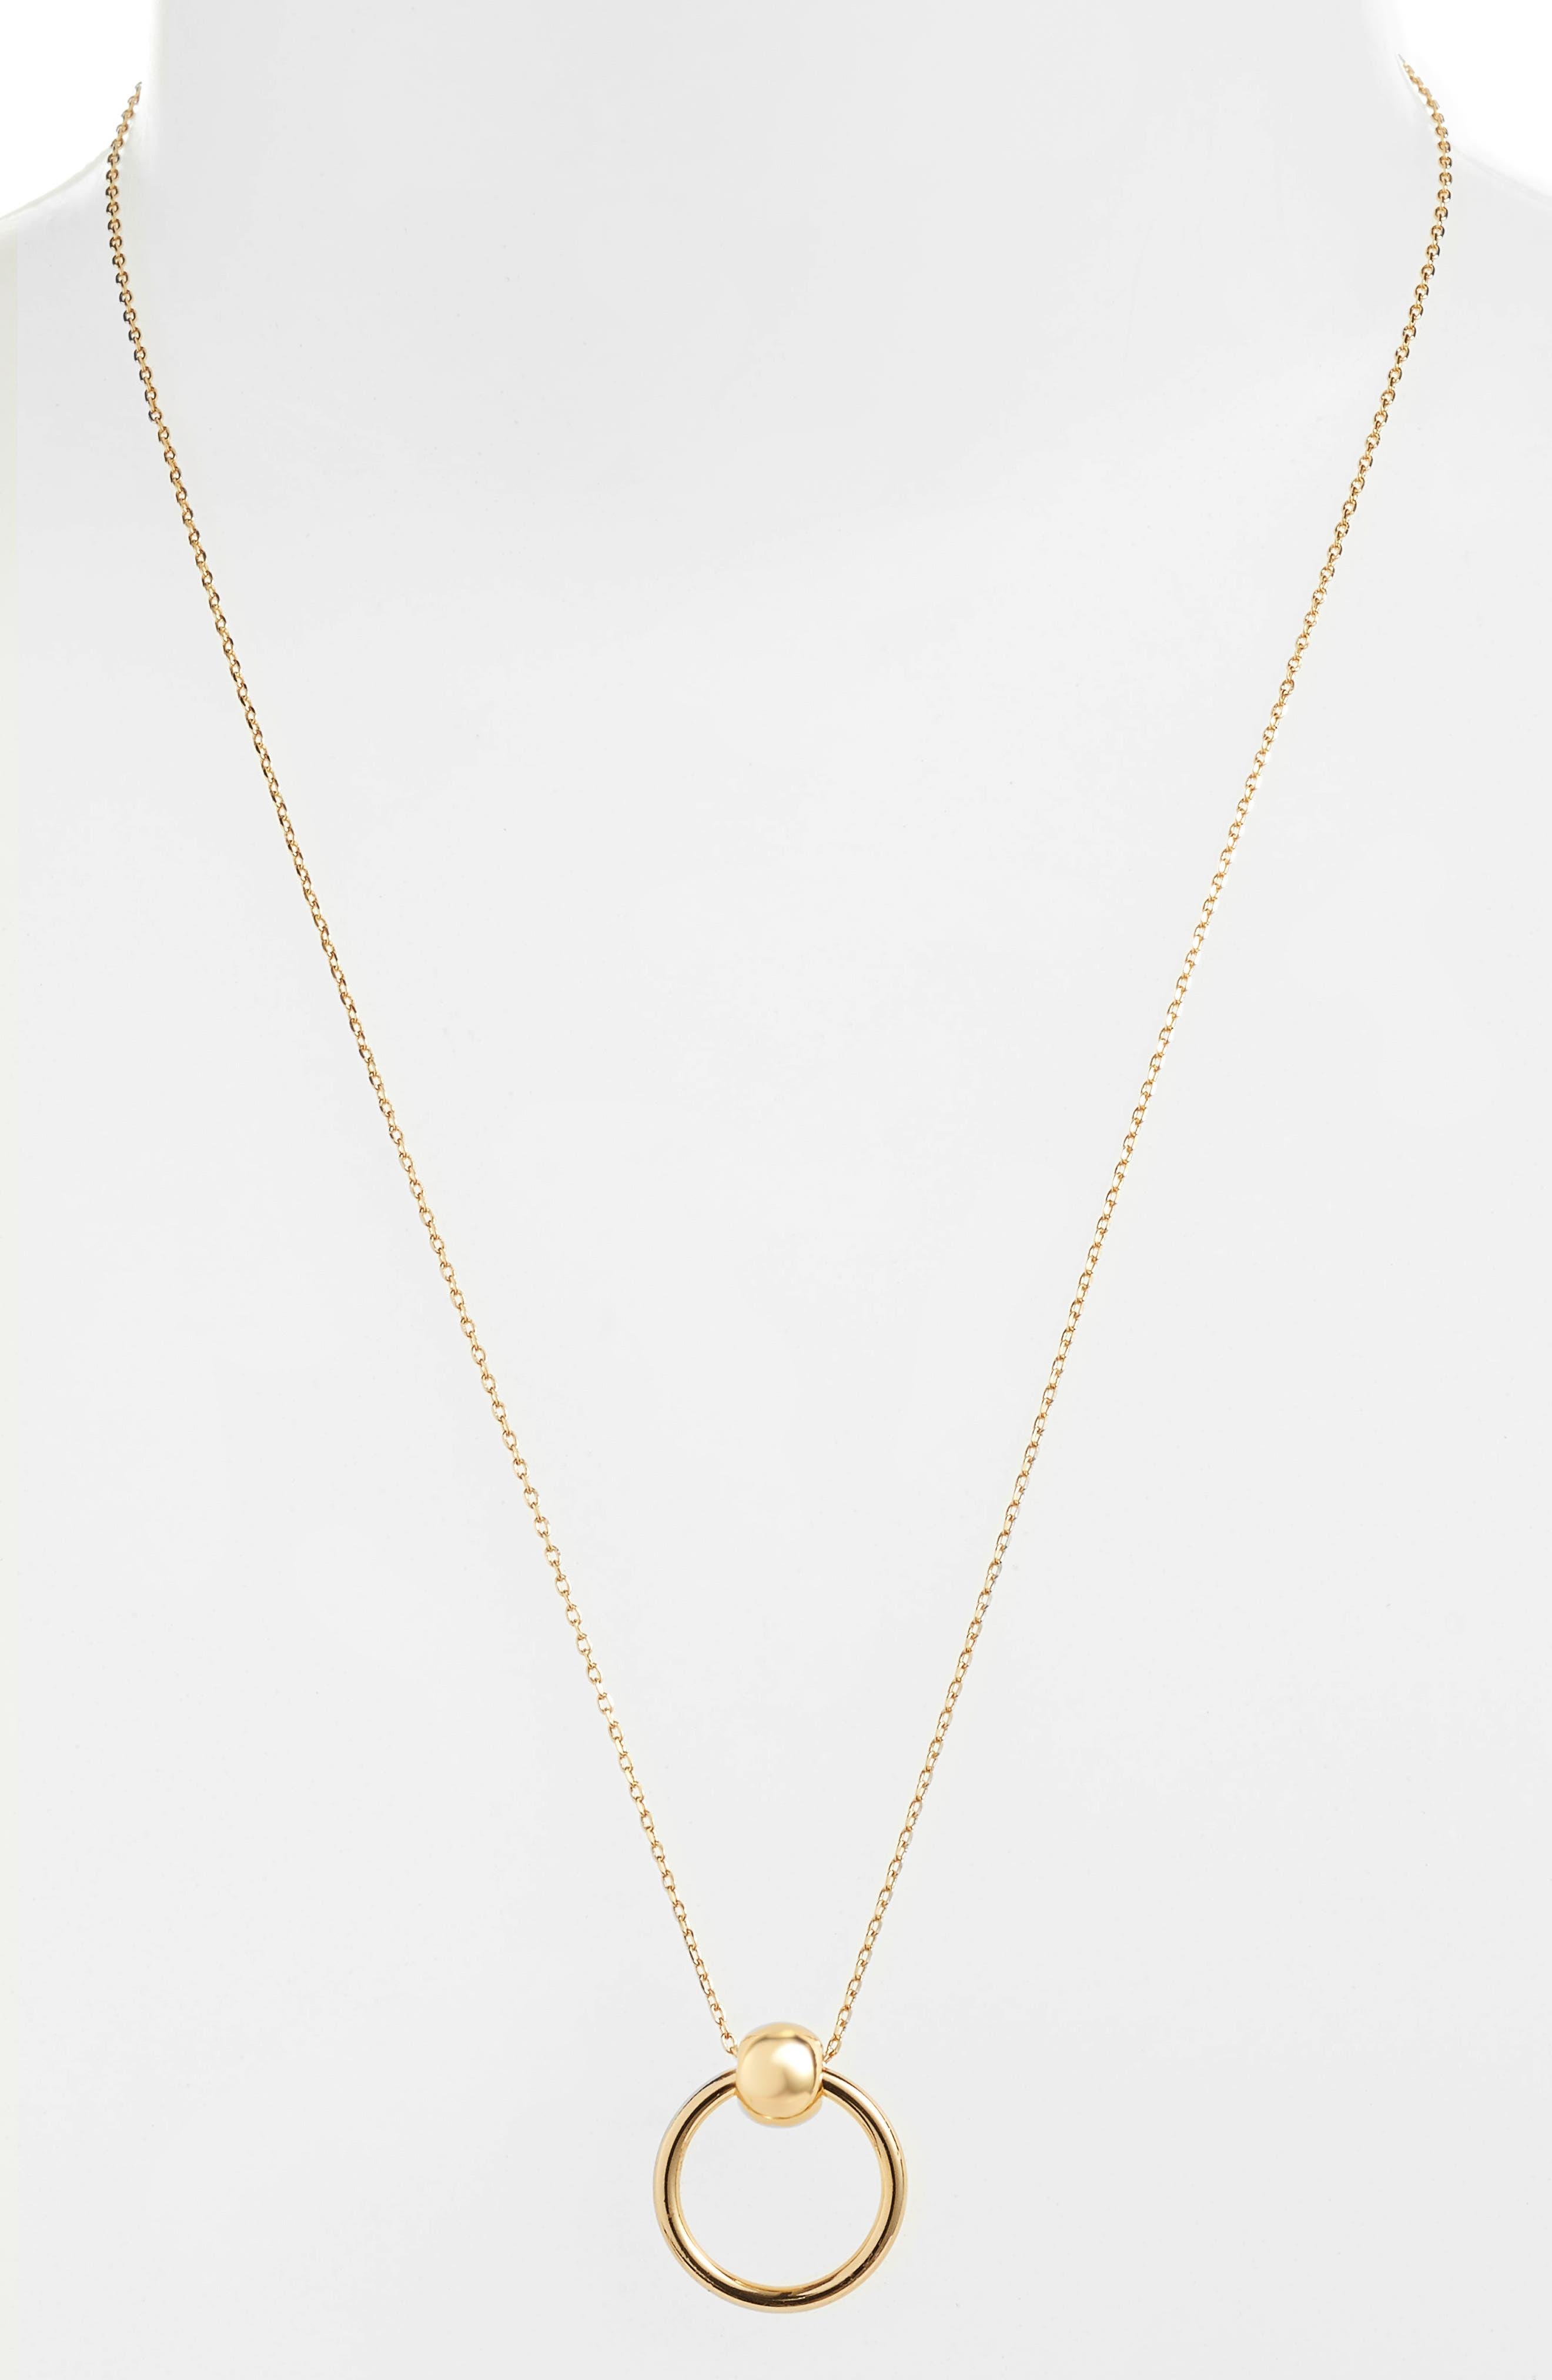 UNCOMMON JAMES BY KRISTIN CAVALLARI Helix Necklace, Main, color, GOLD